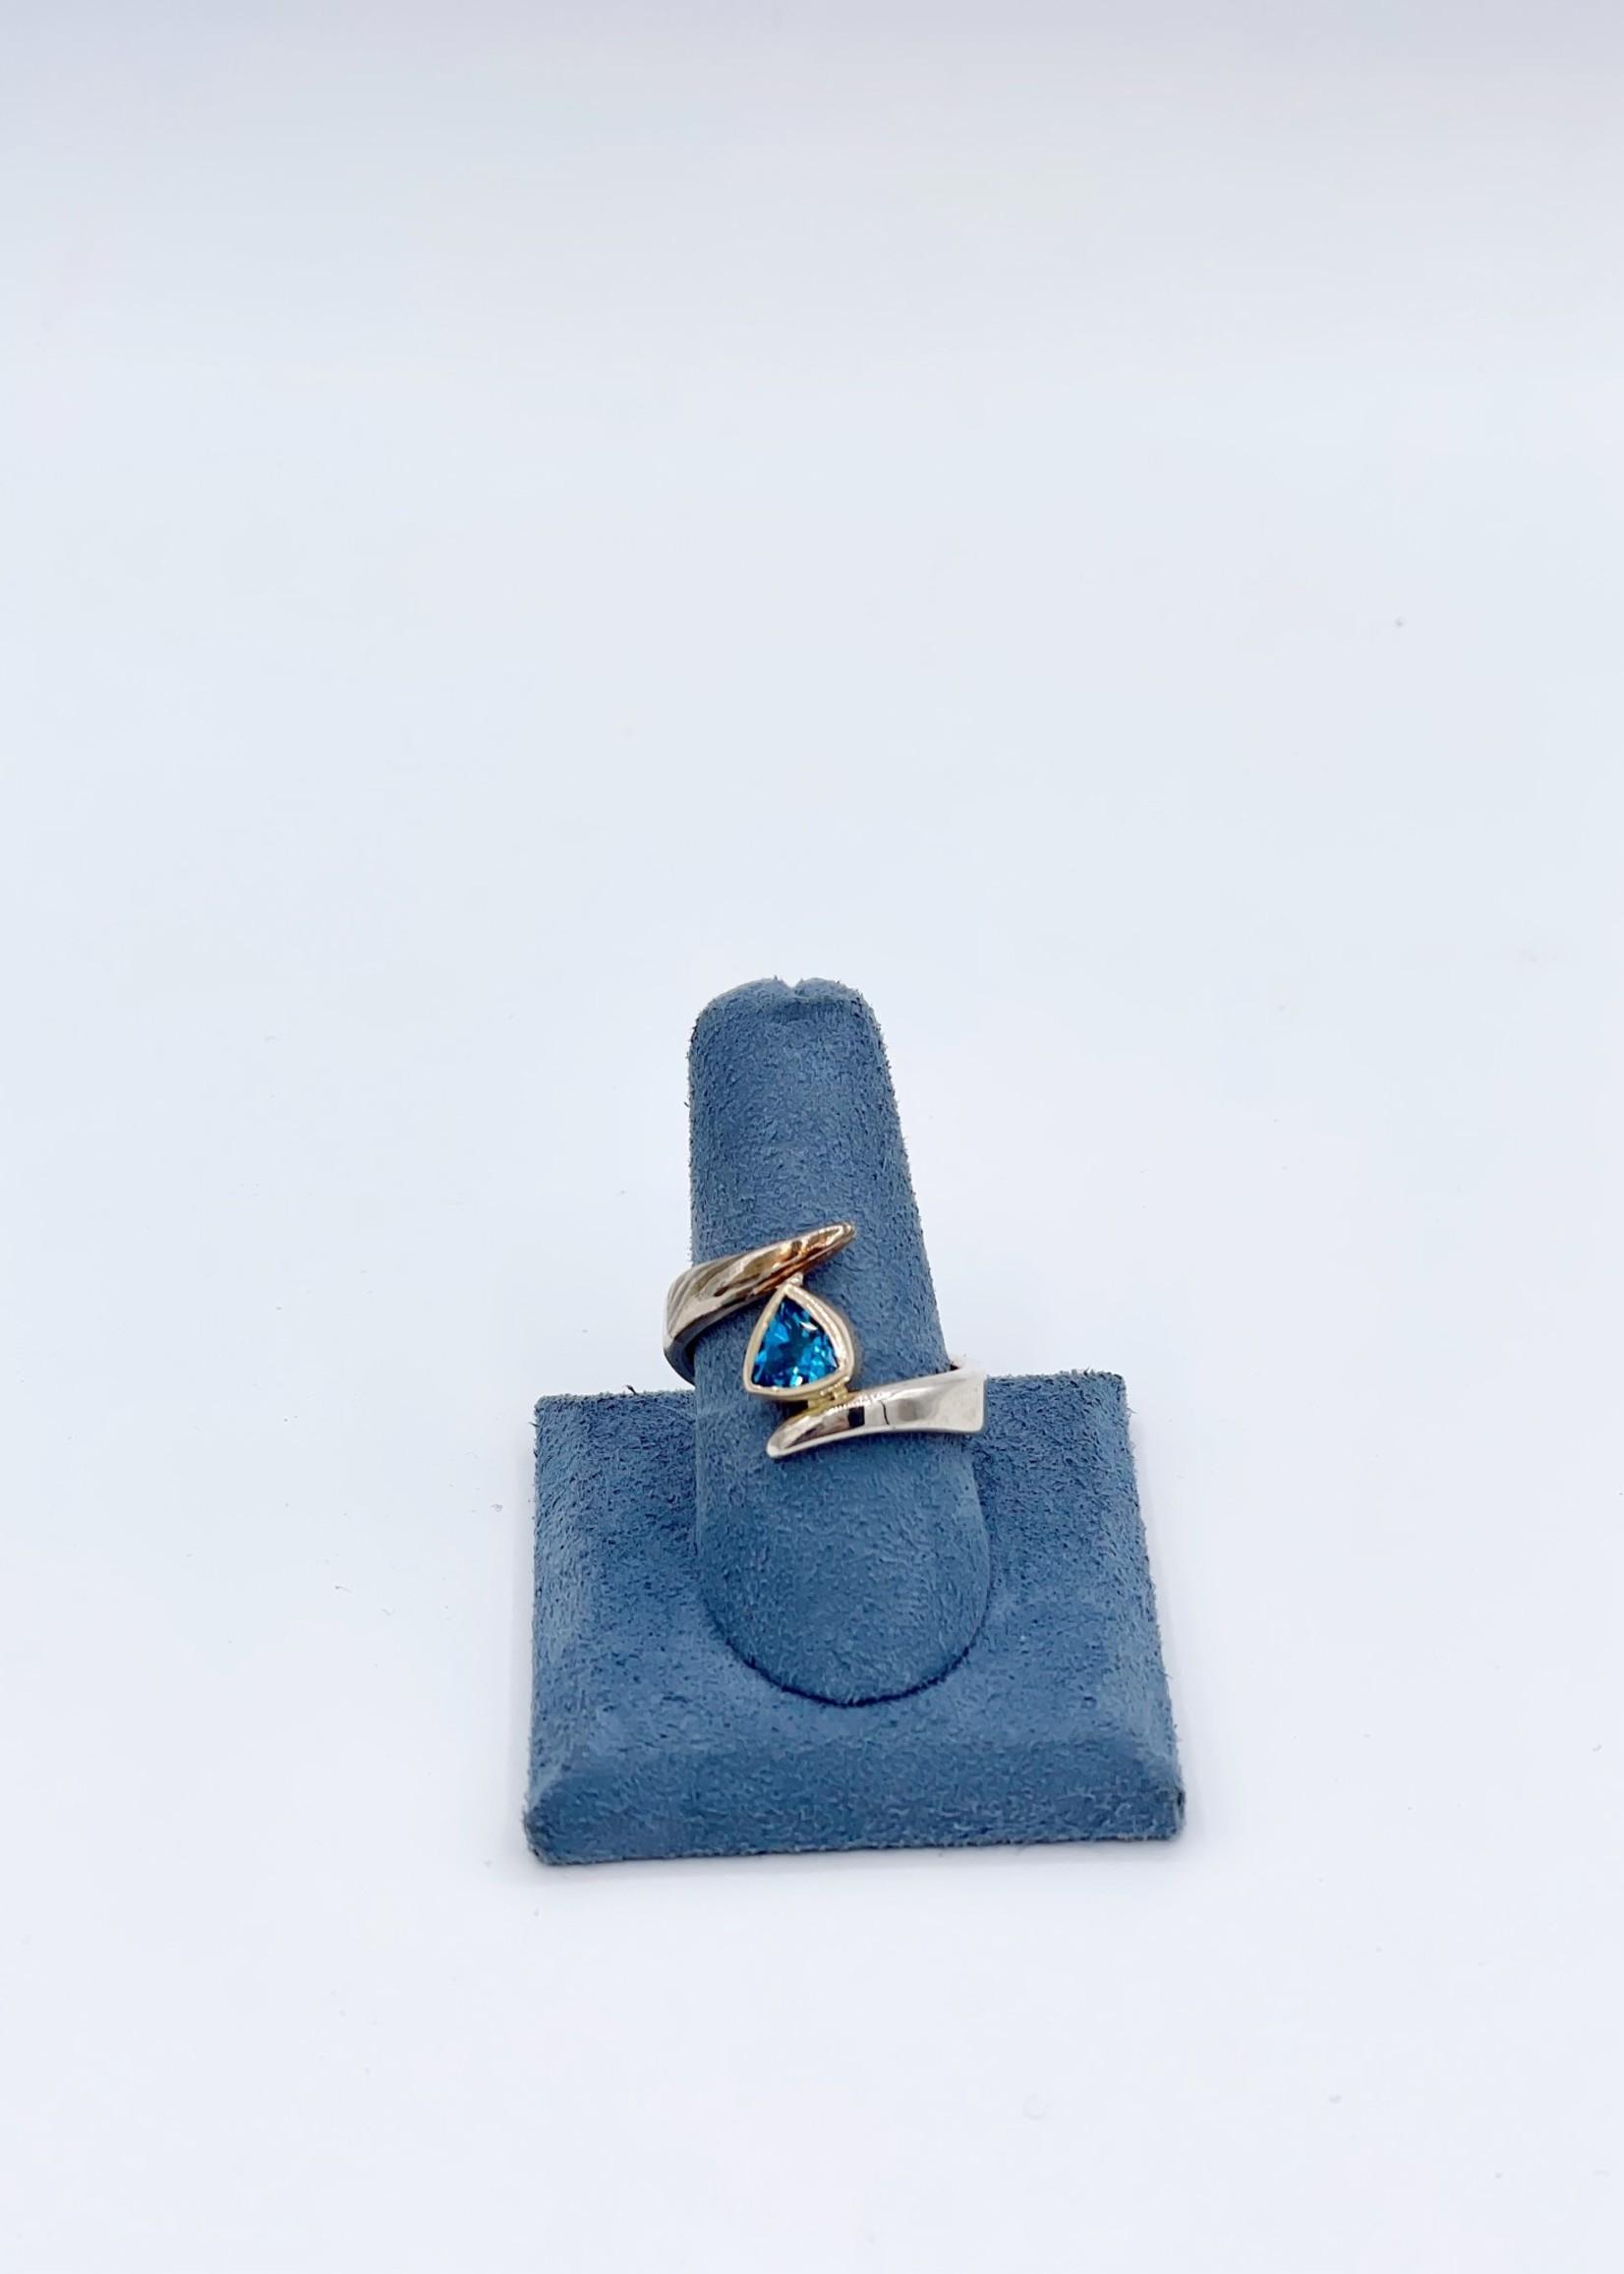 CJ Designs Sterl & Mokume w/ trill Blue Topaz